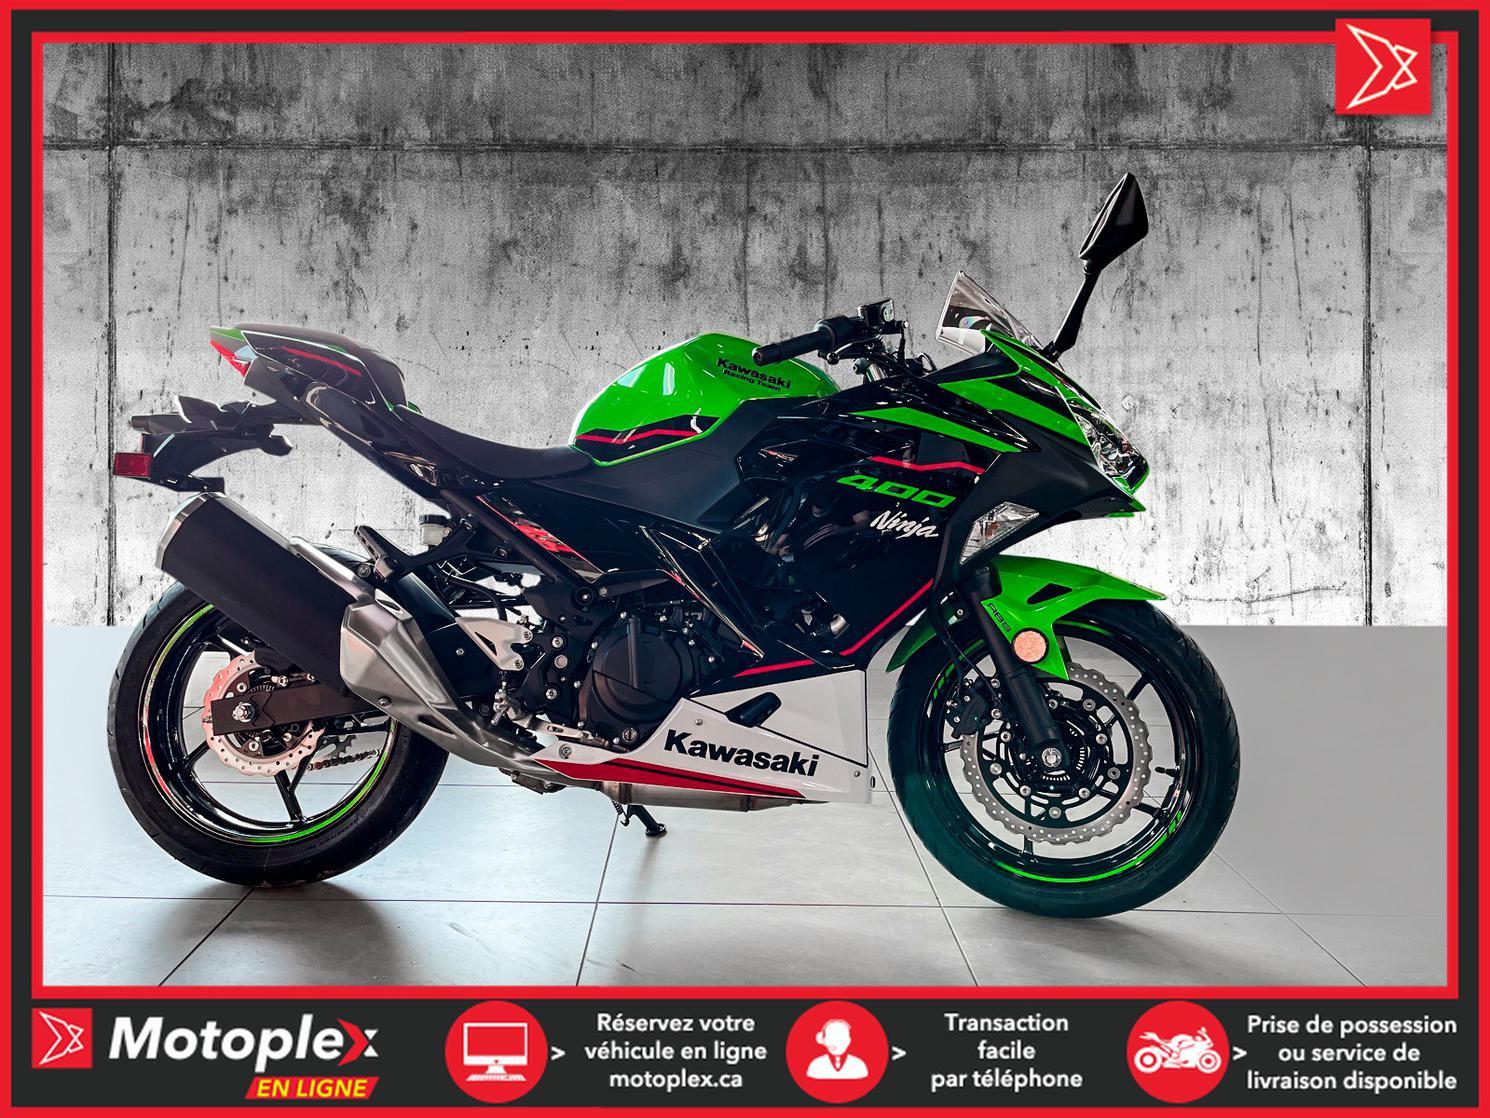 2021 Kawasaki NINJA 400 ABS KRT EDITION 2021